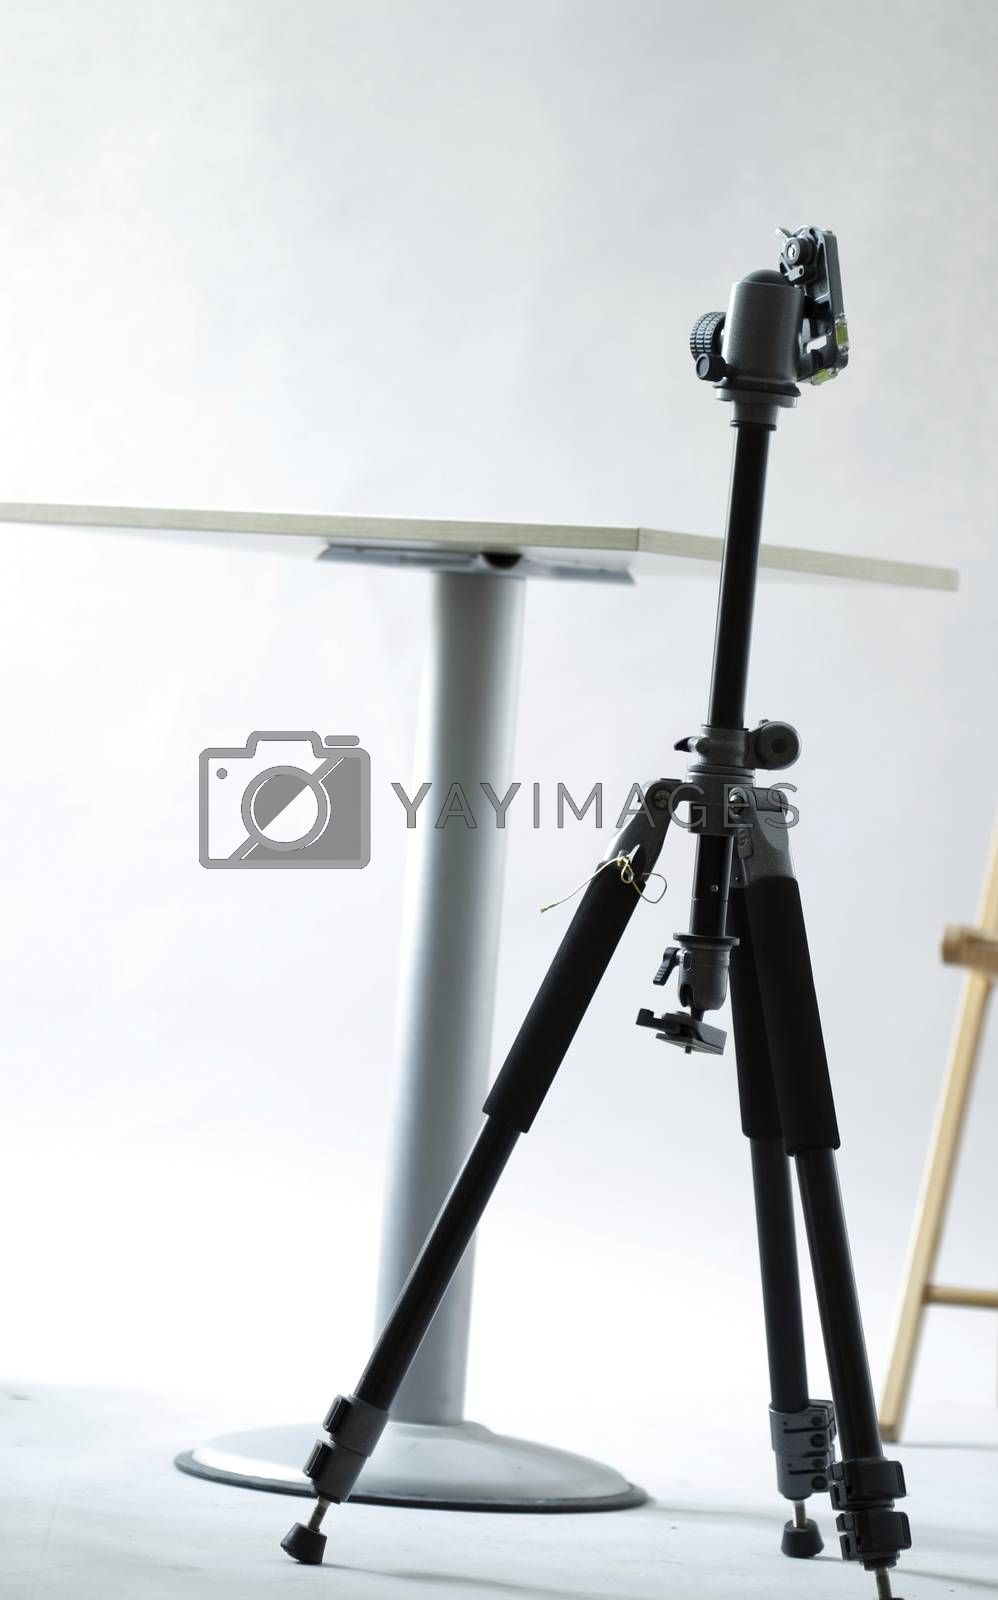 Photo of my studio stage - all my decor